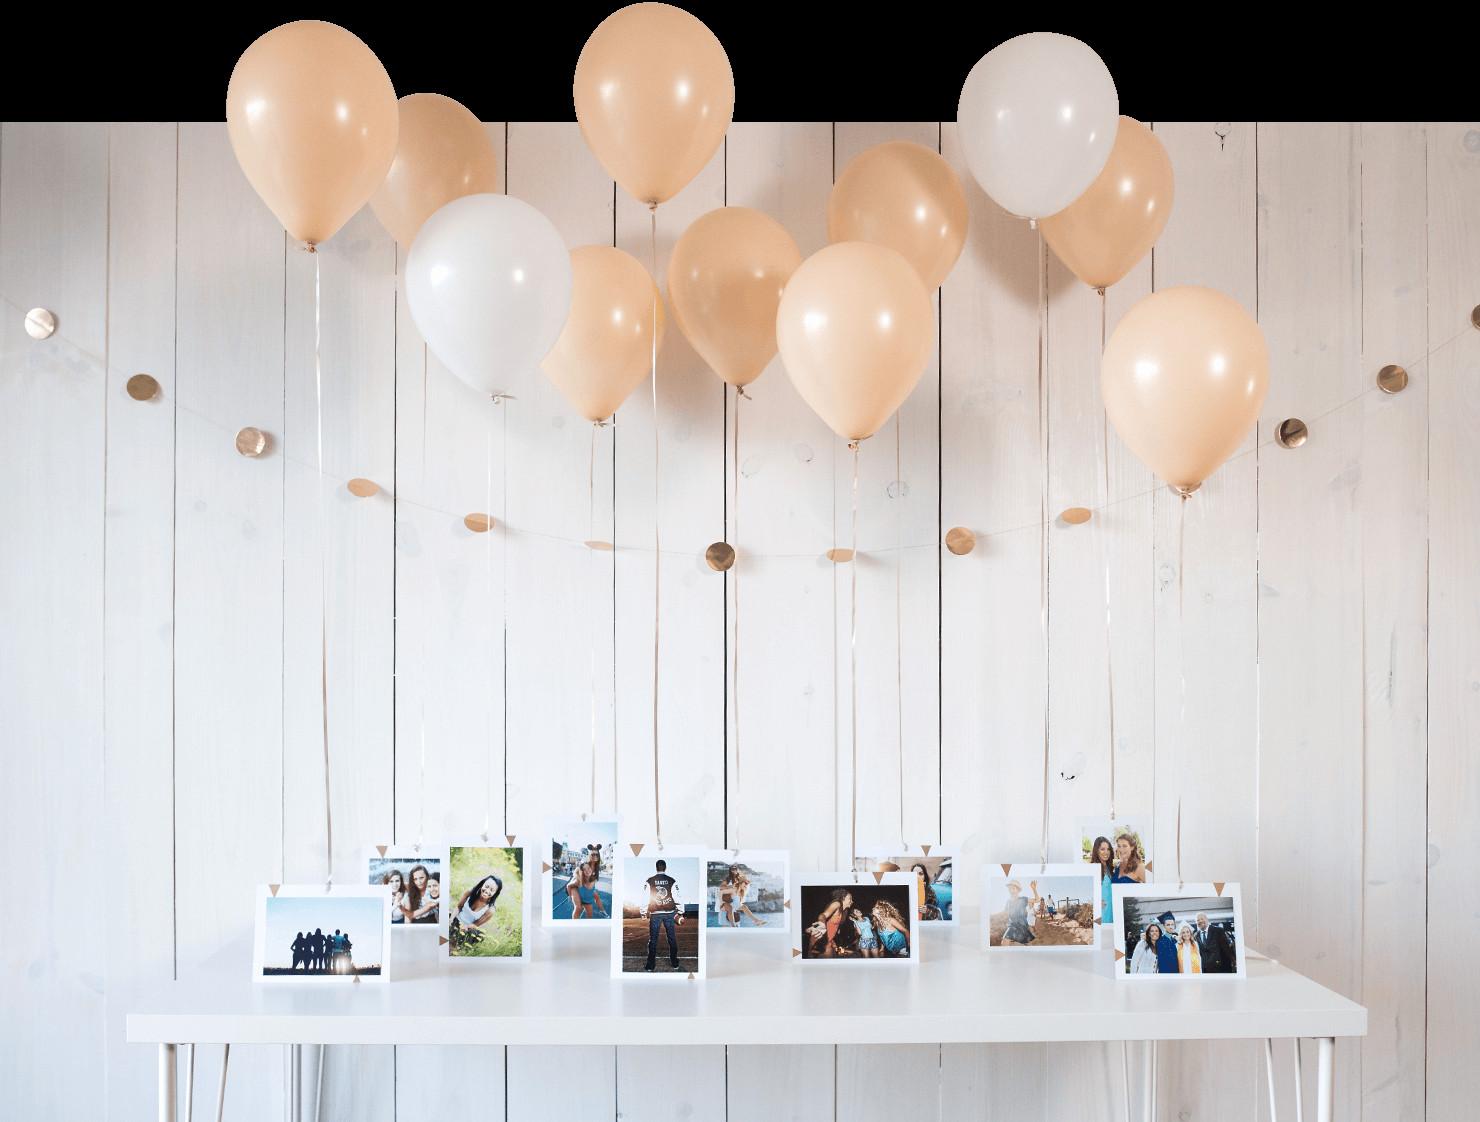 Homemade Graduation Party Decoration Ideas  7 Easy DIY Graduation Party Ideas 2020